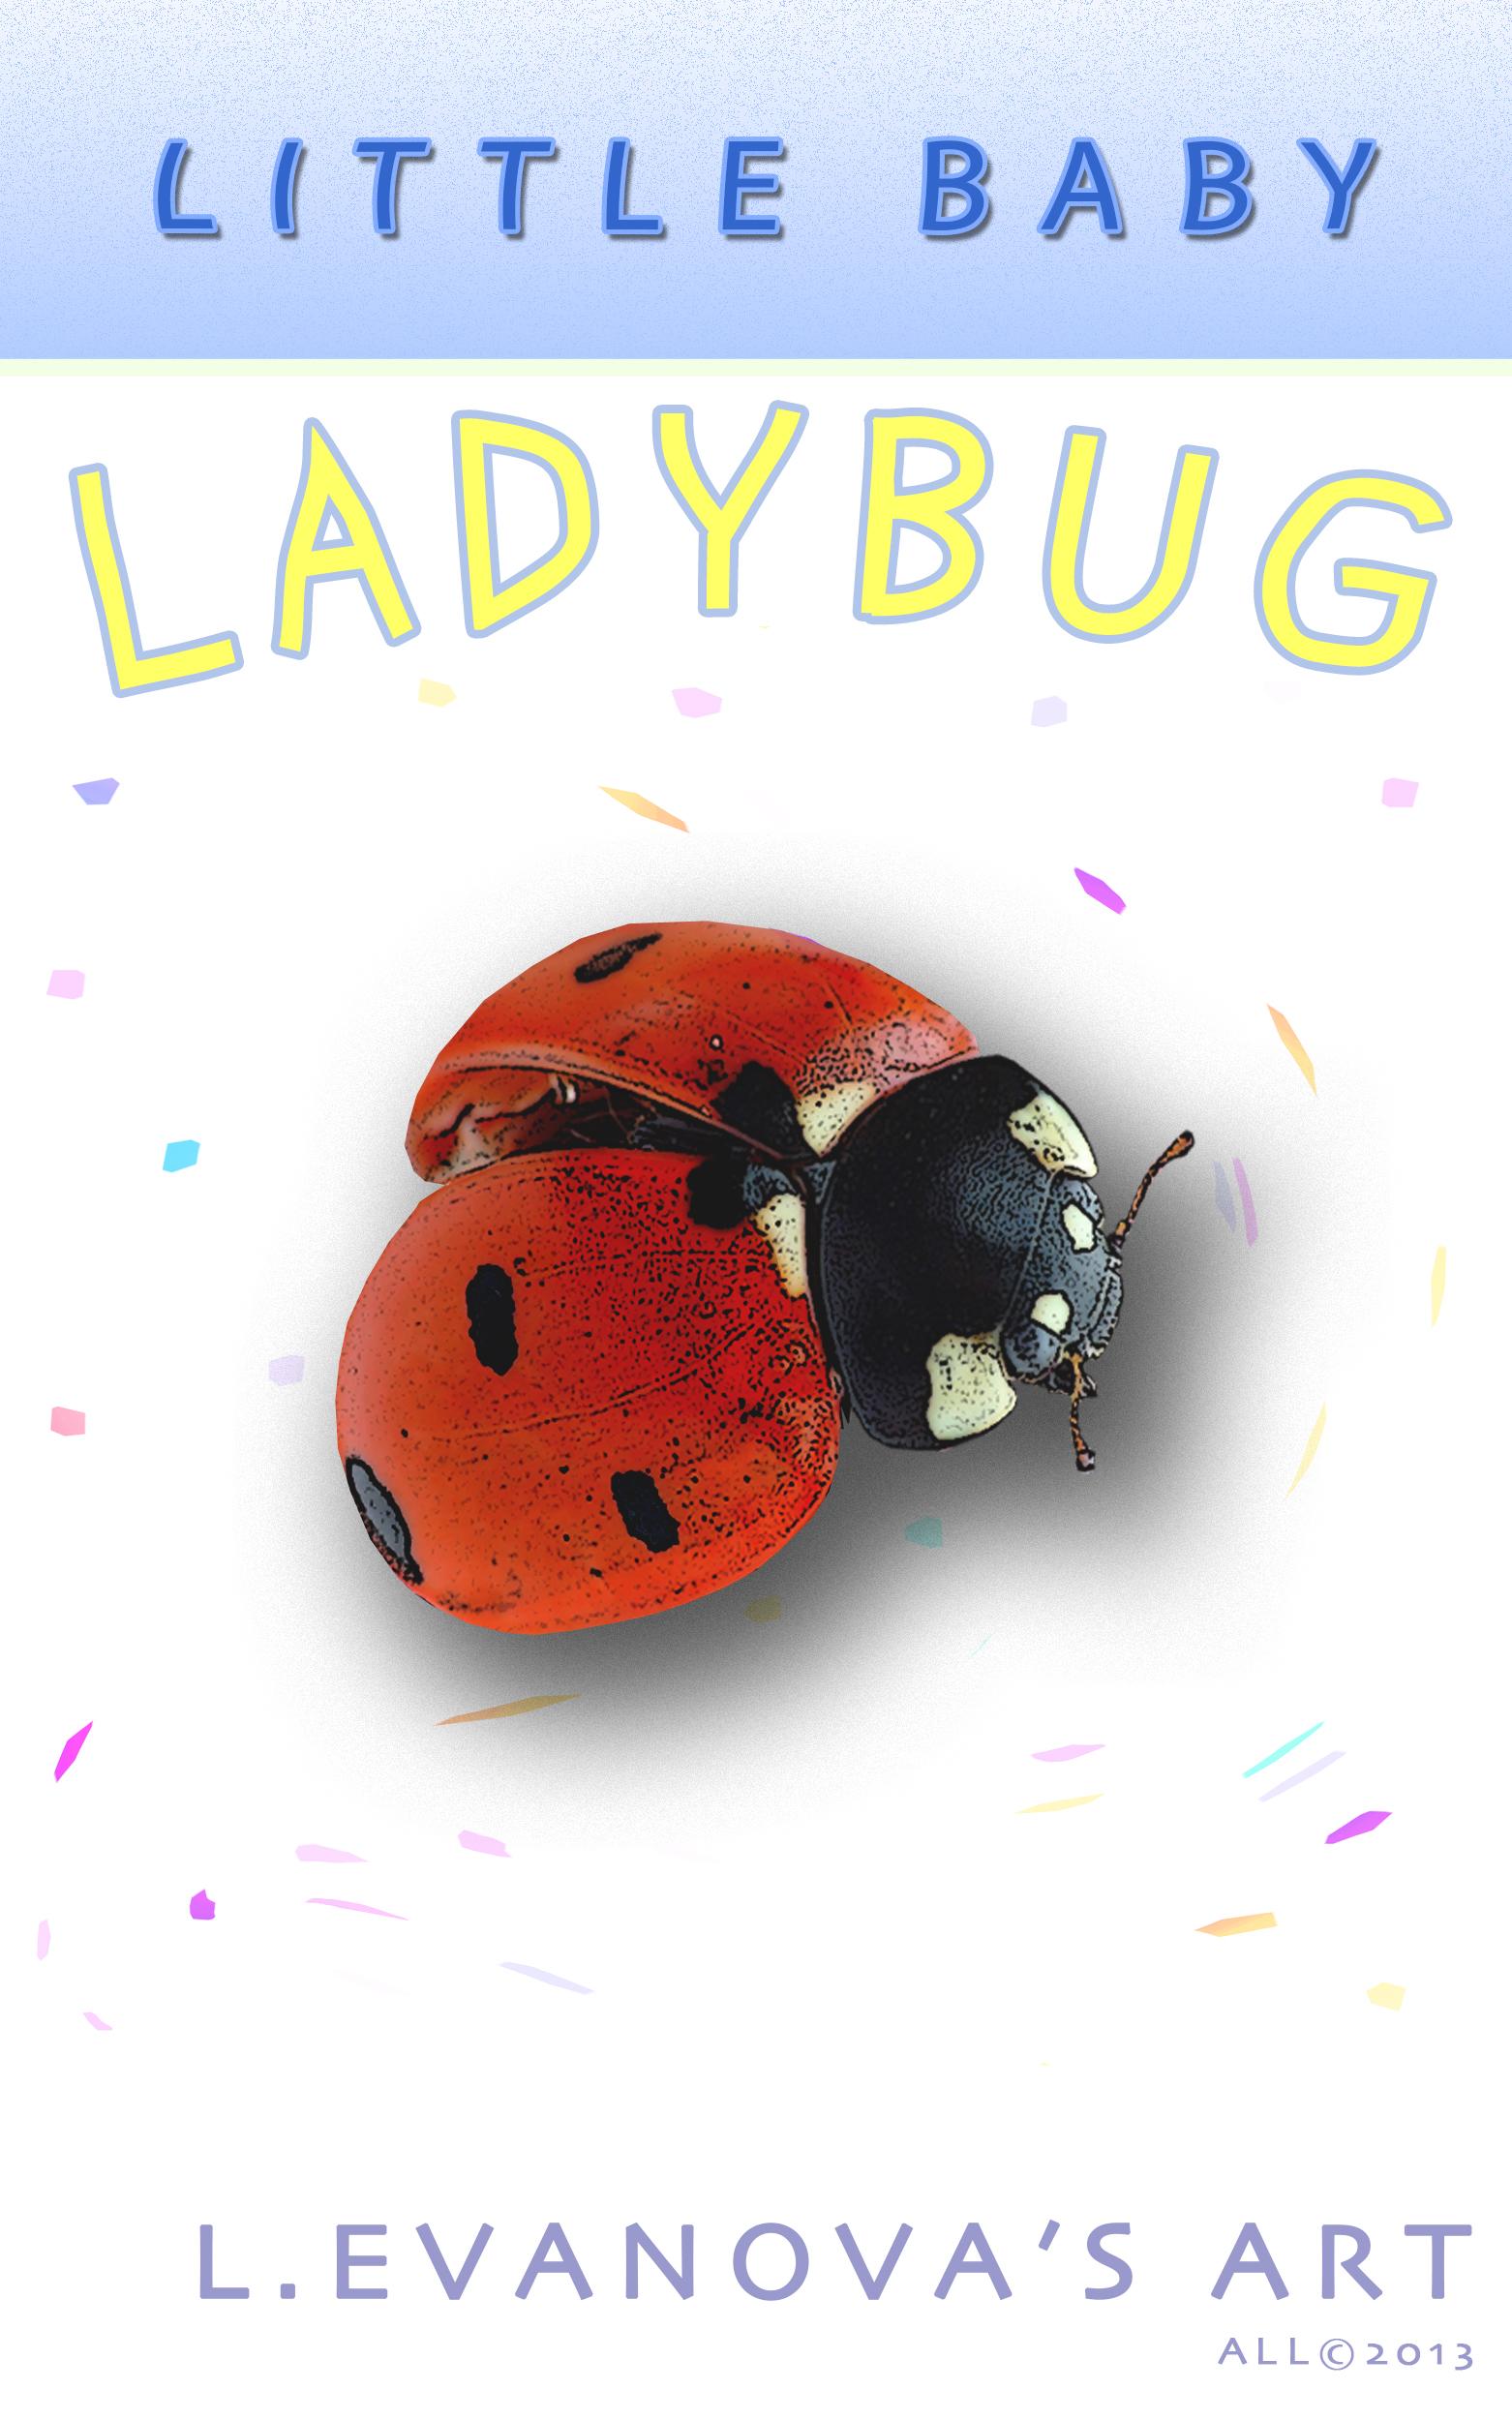 L-Baby-LADYBUG